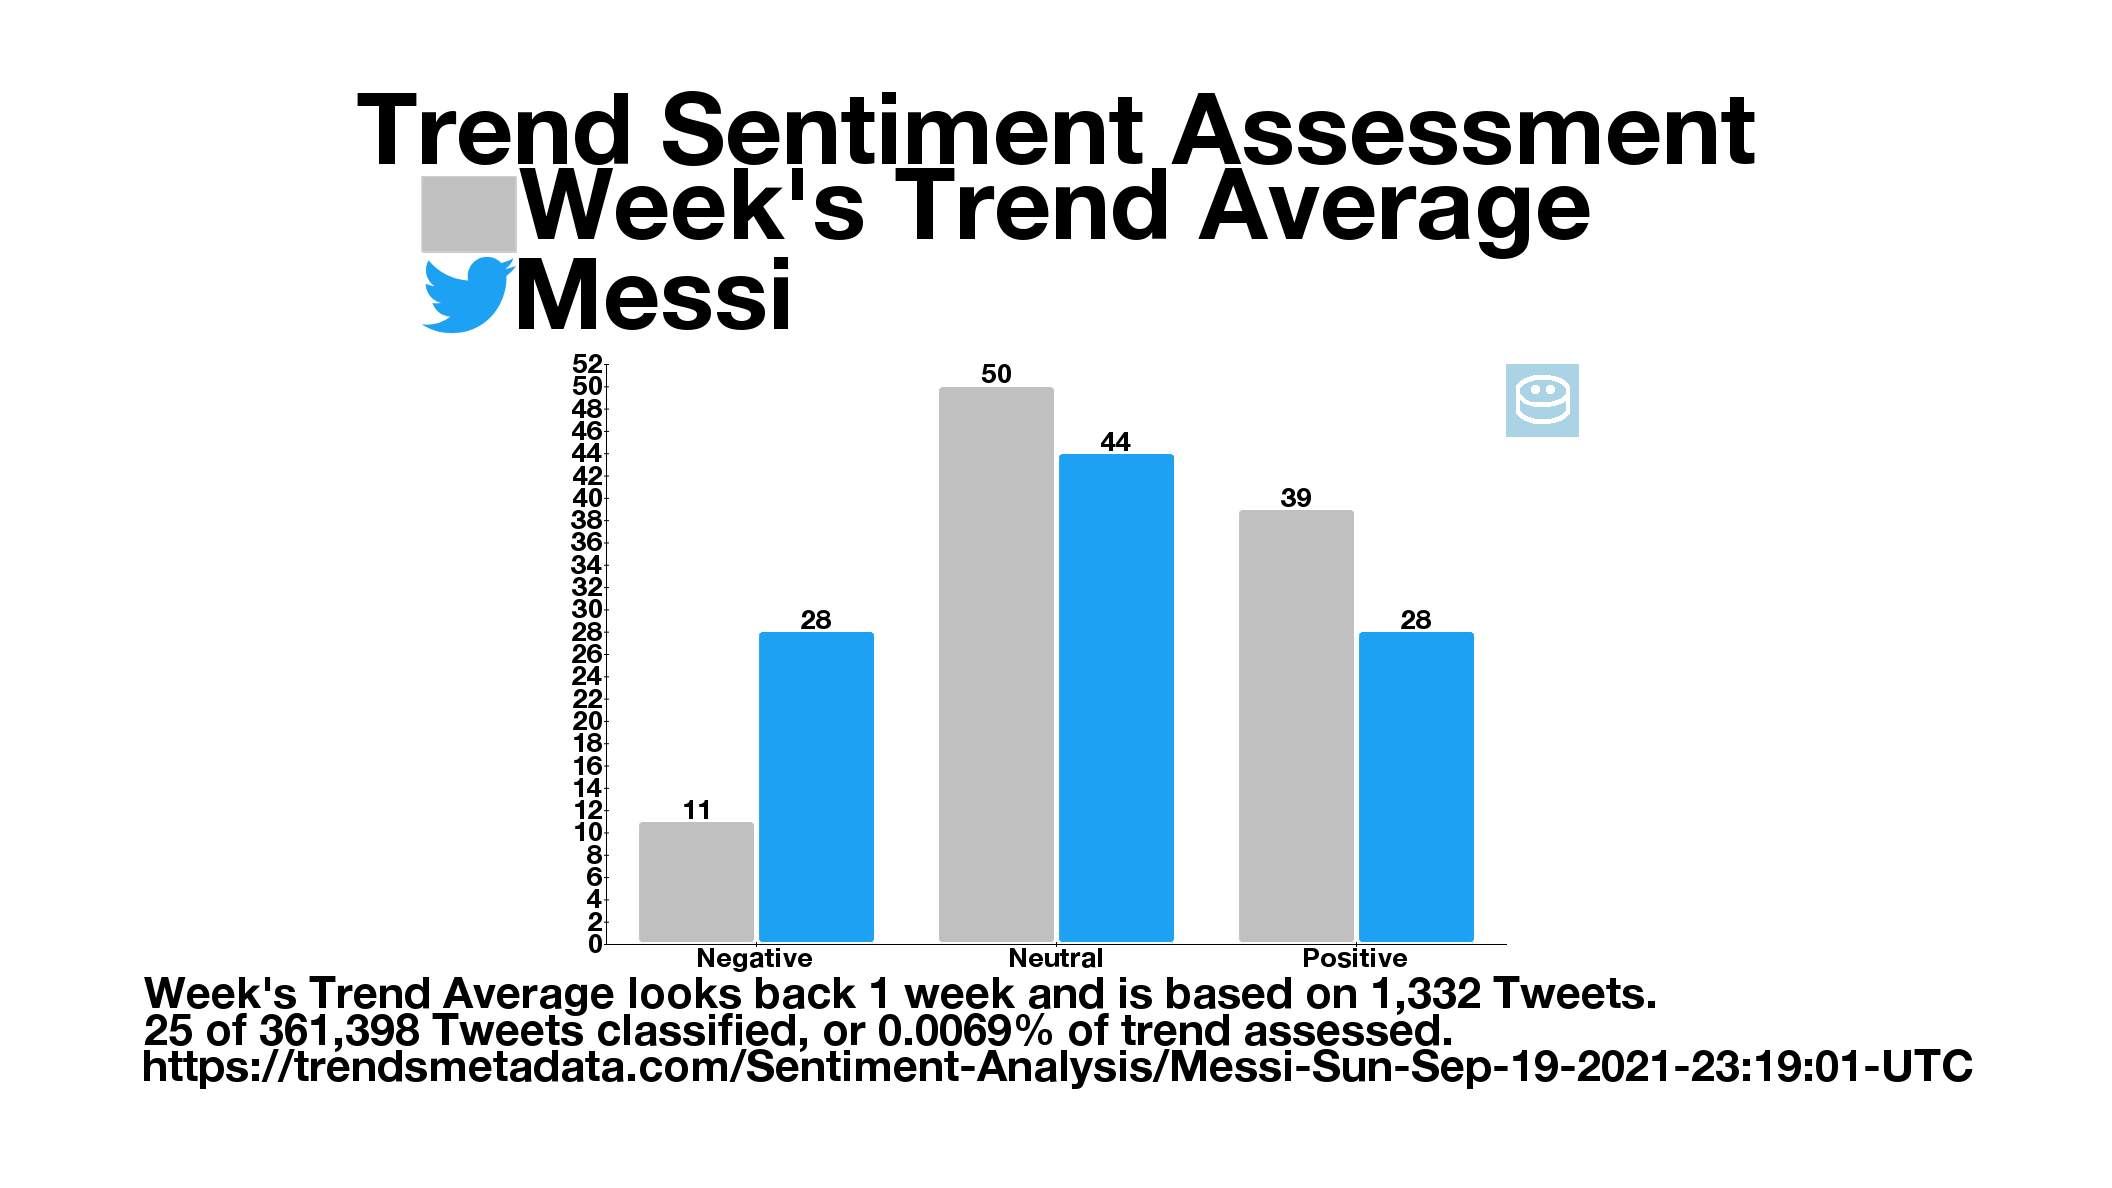 Messi-Sun-Sep-19-2021-23:19:01-UTC